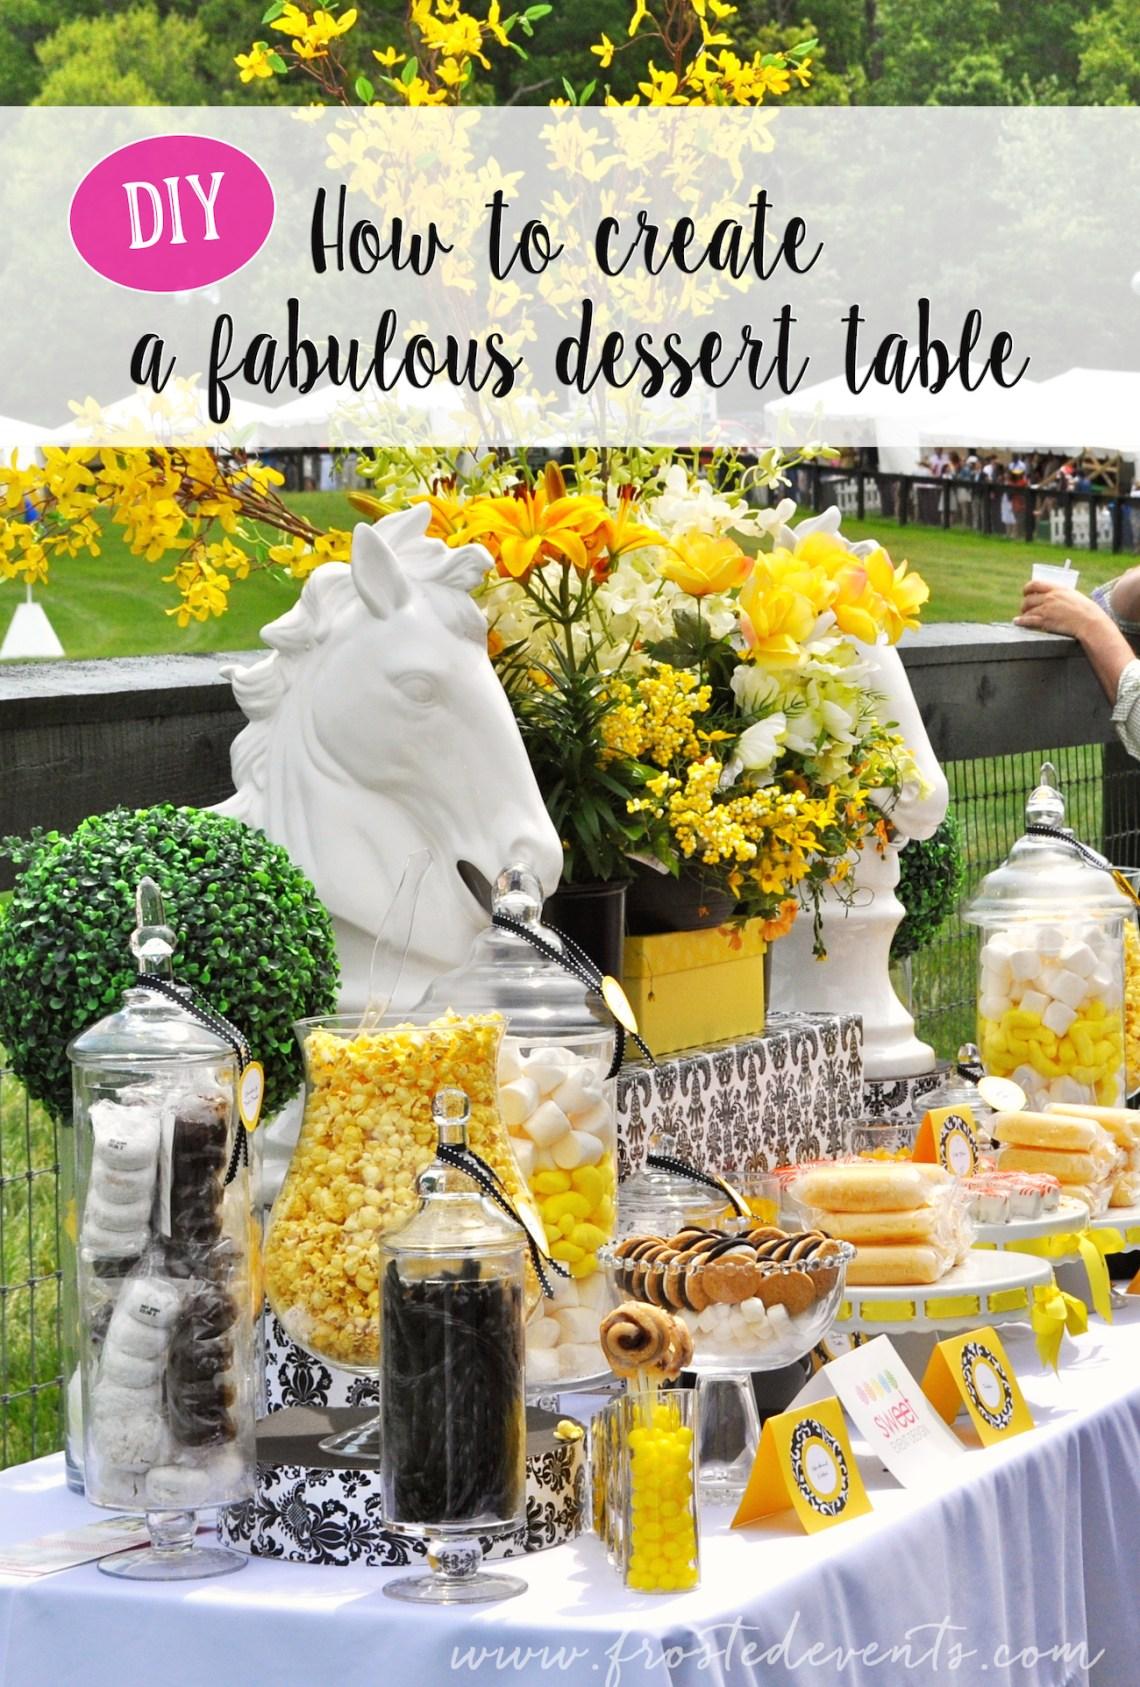 Dessert Table Candy Buffet Wedding Ideas Inspiration Horse Derby Theme frostedevents #desserttable #candybuffet #wedding